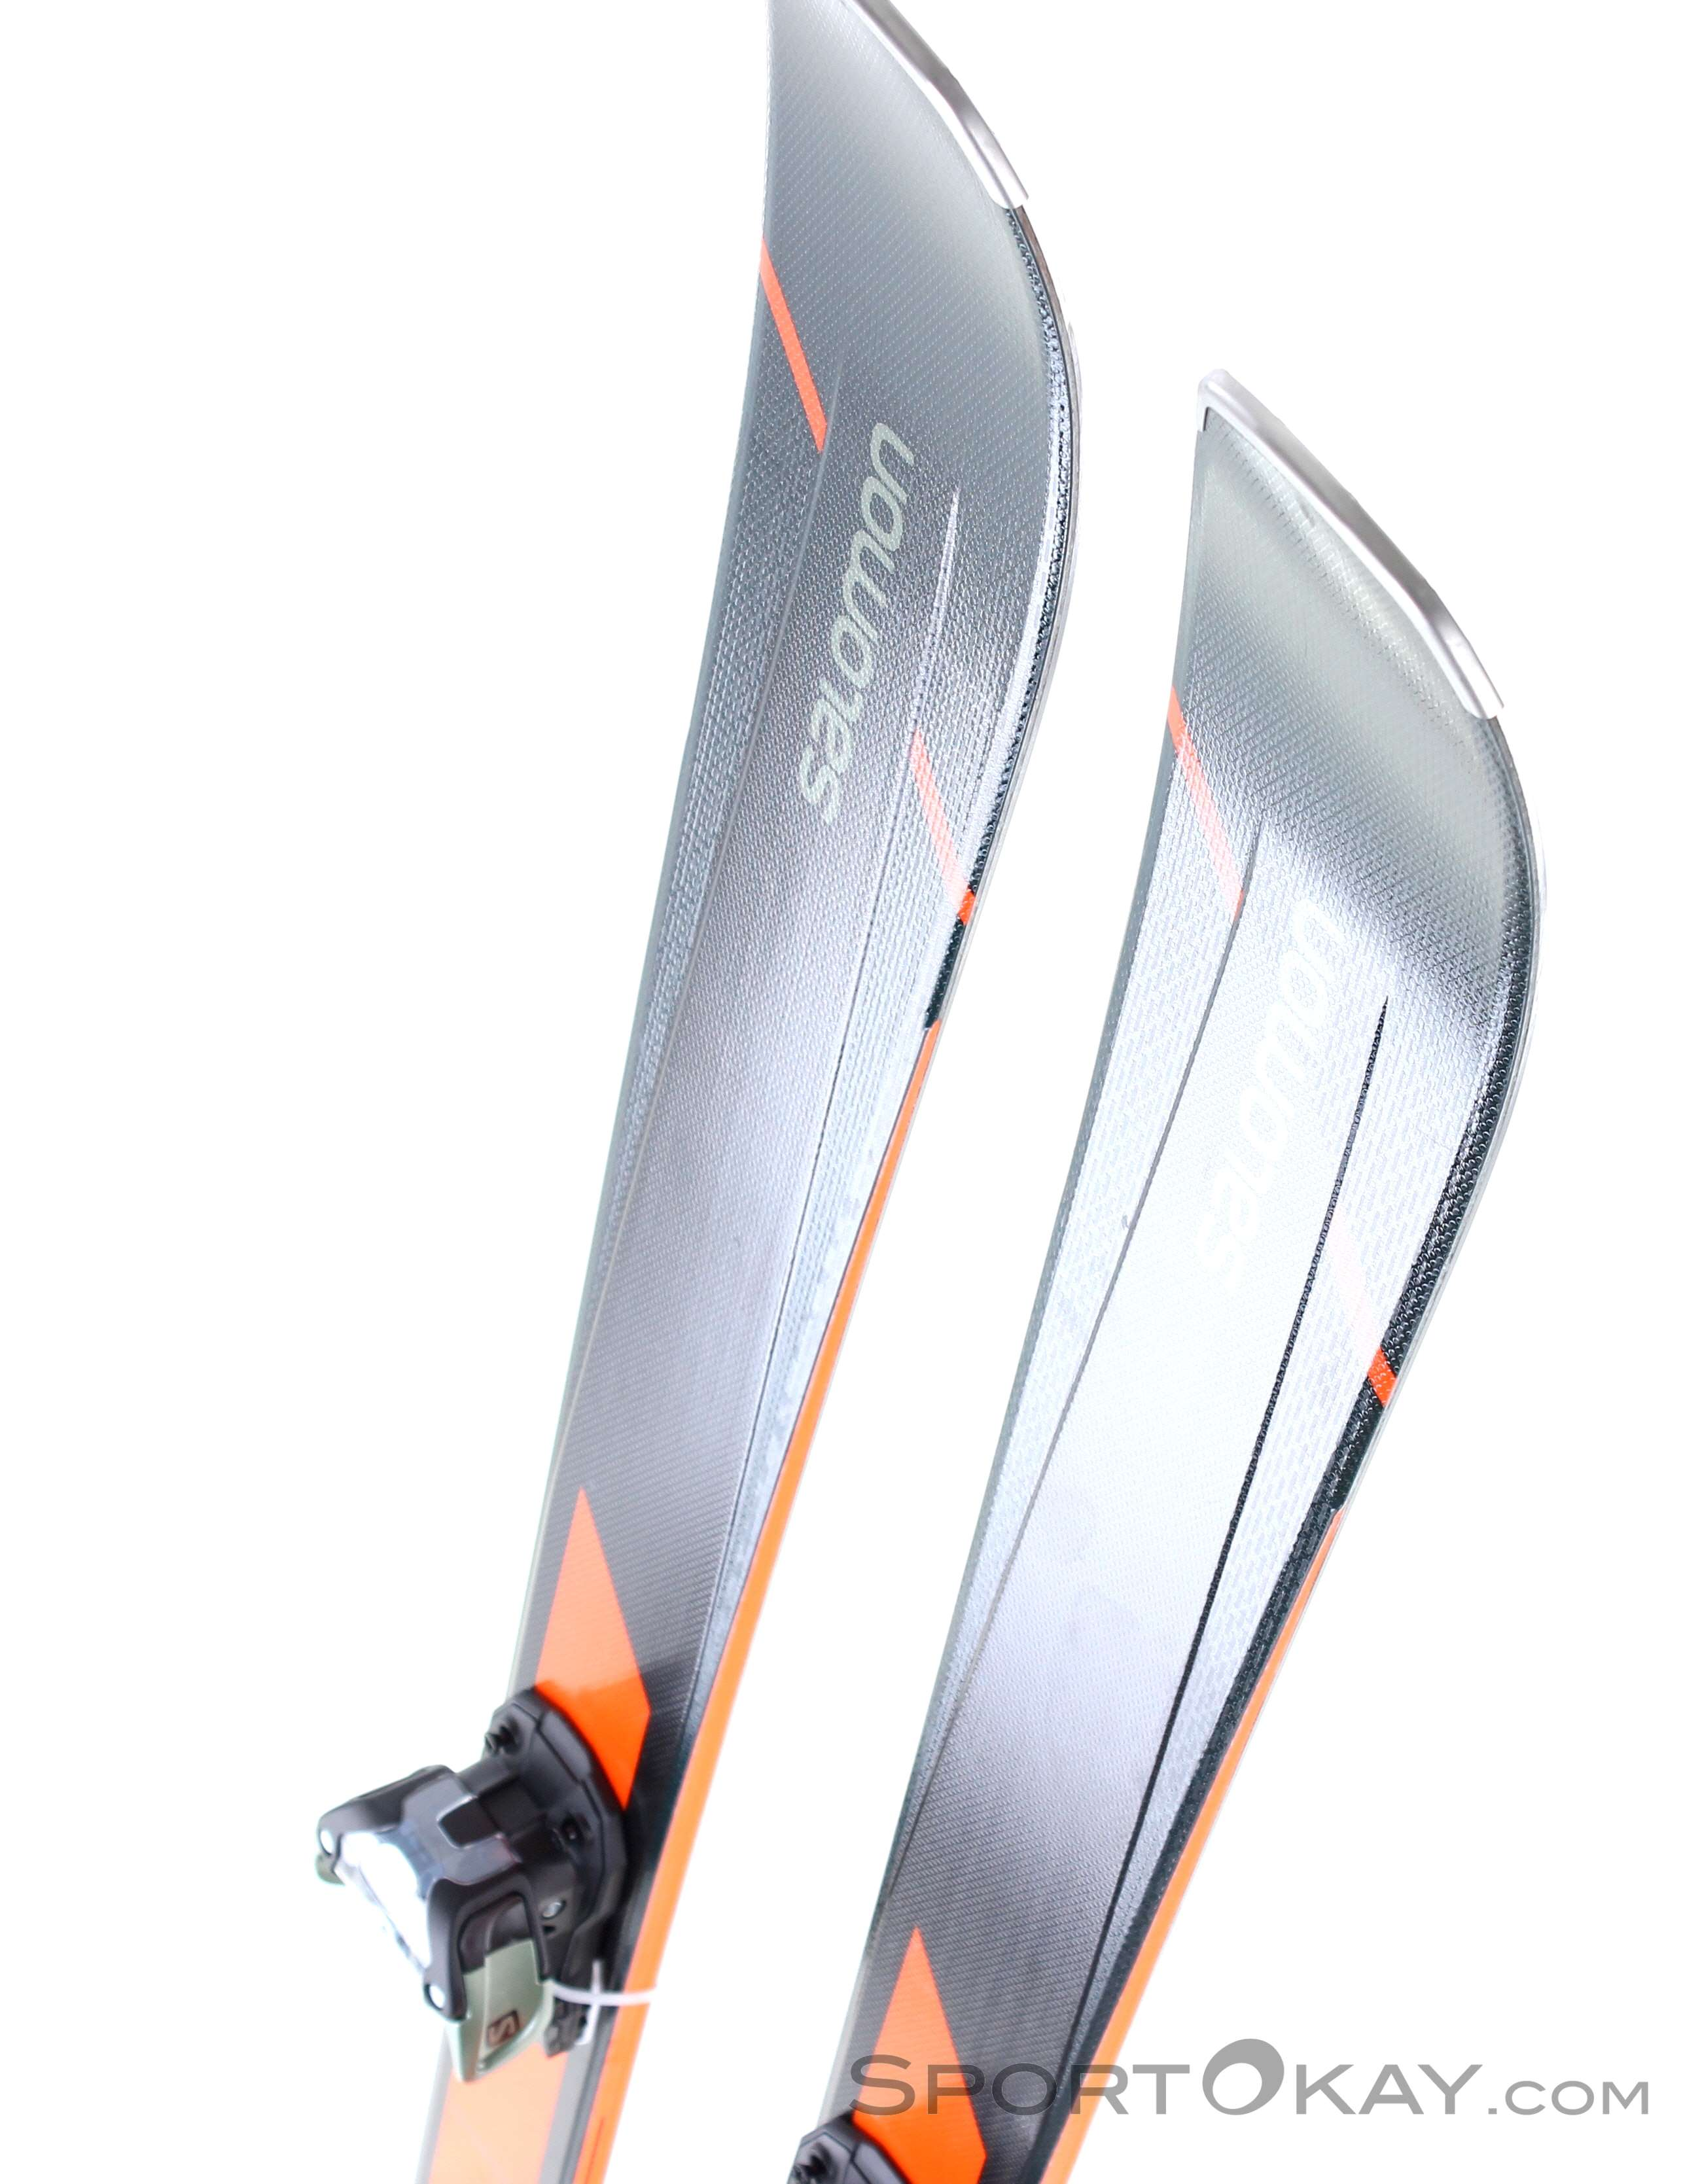 Salomon Salomon XDR 88 TI + Warden MNC 13 Demo Ski Set 2020